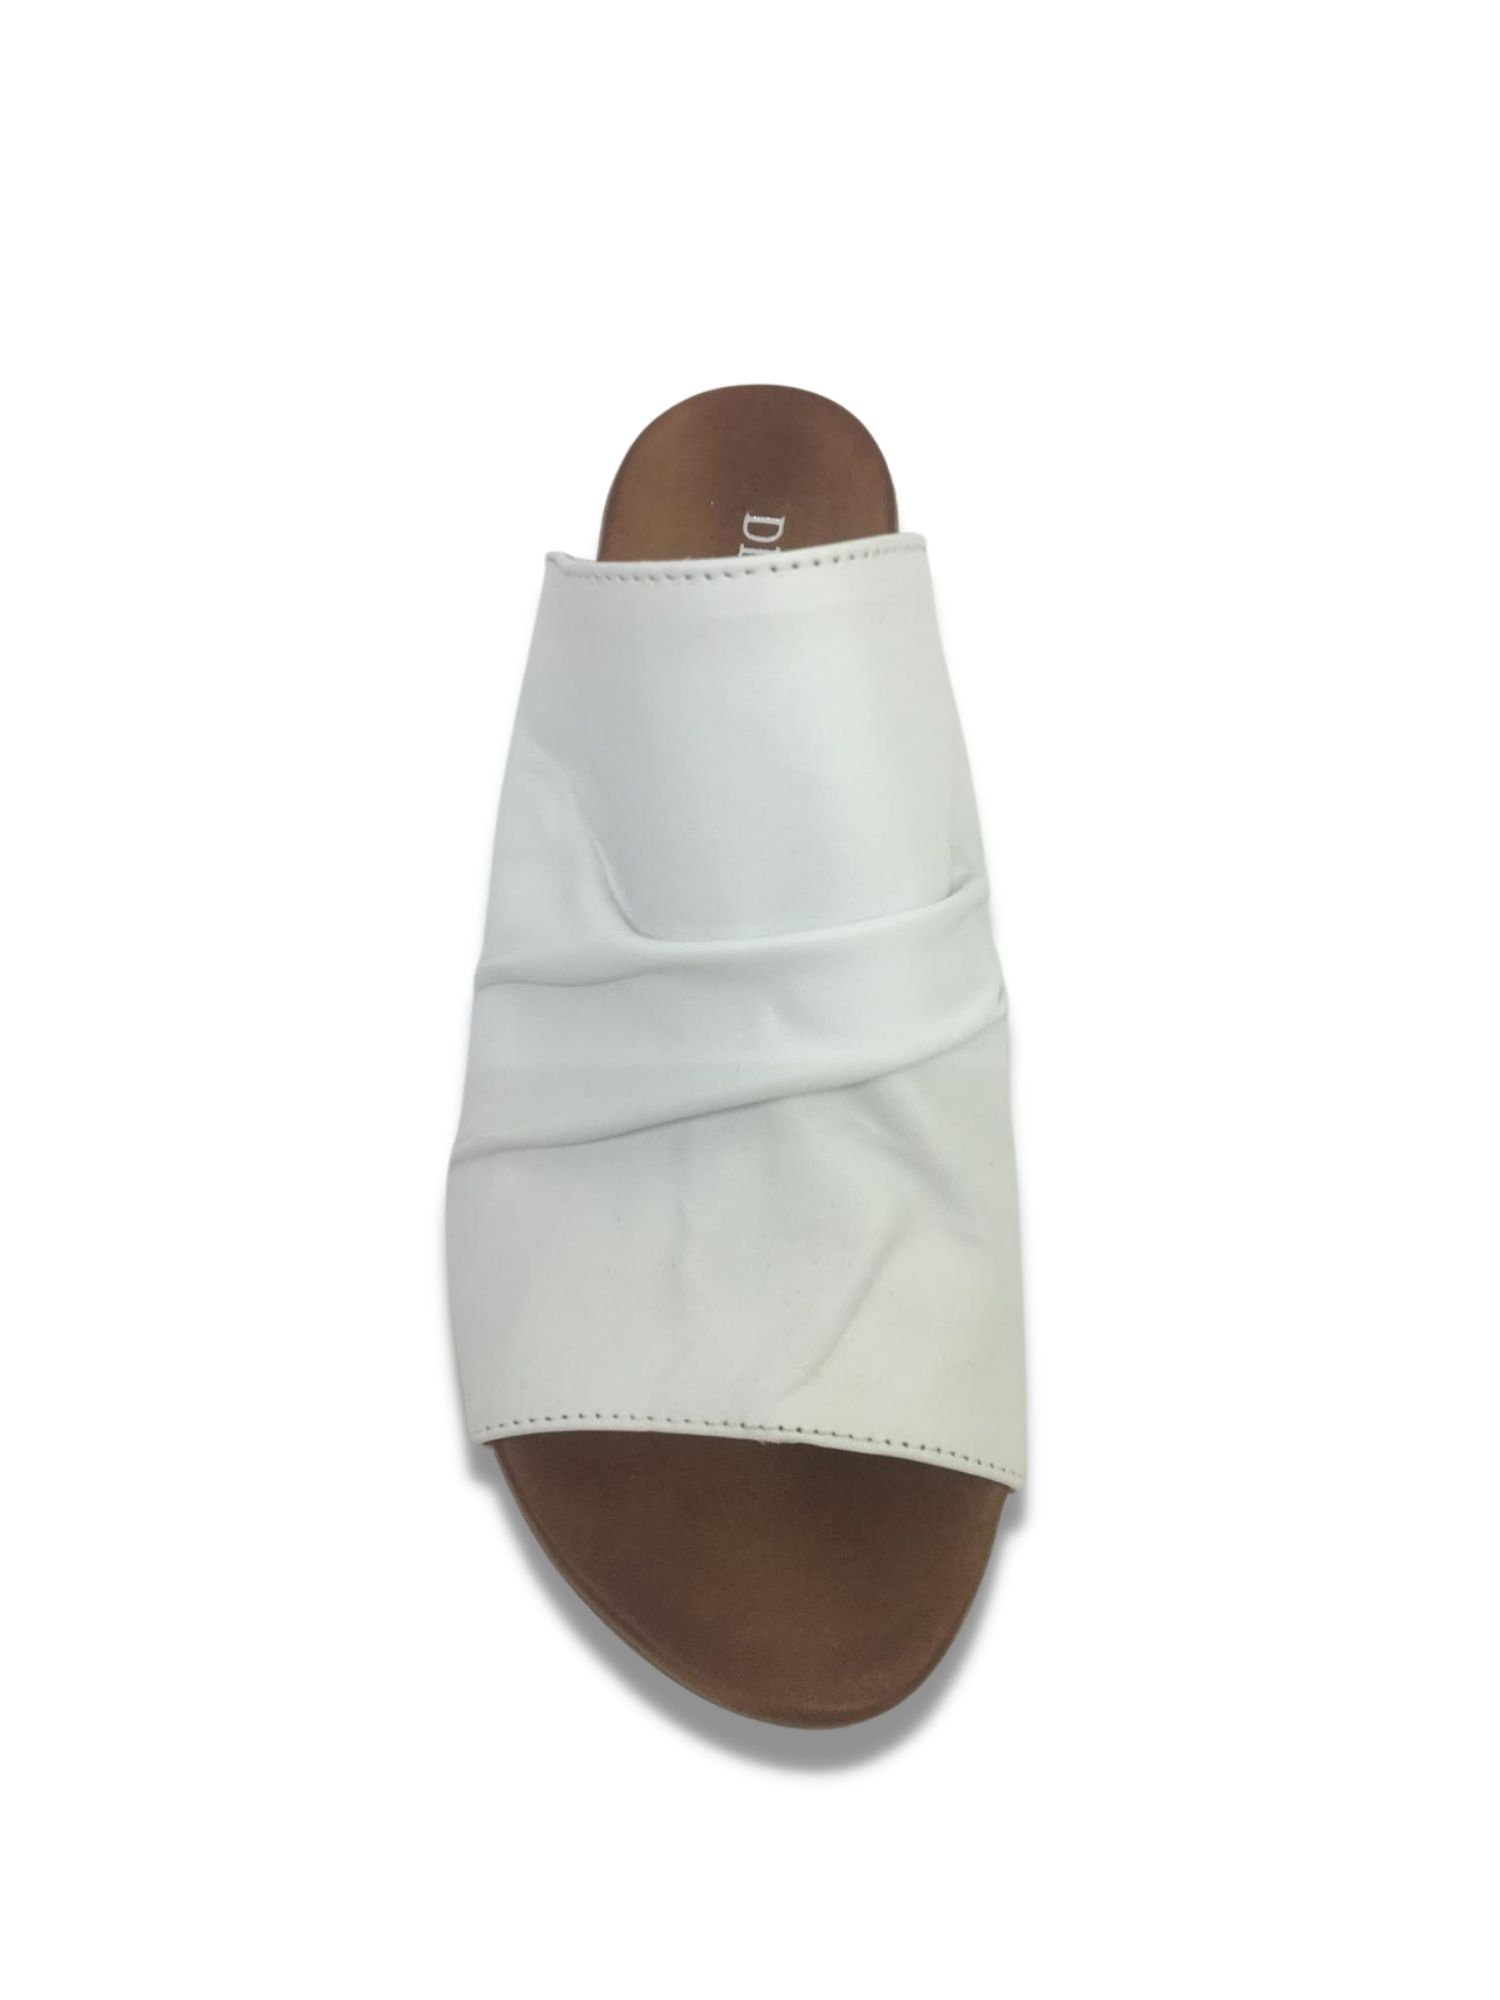 Sandalo Scalzato Made in Italy 207 Bianco alto